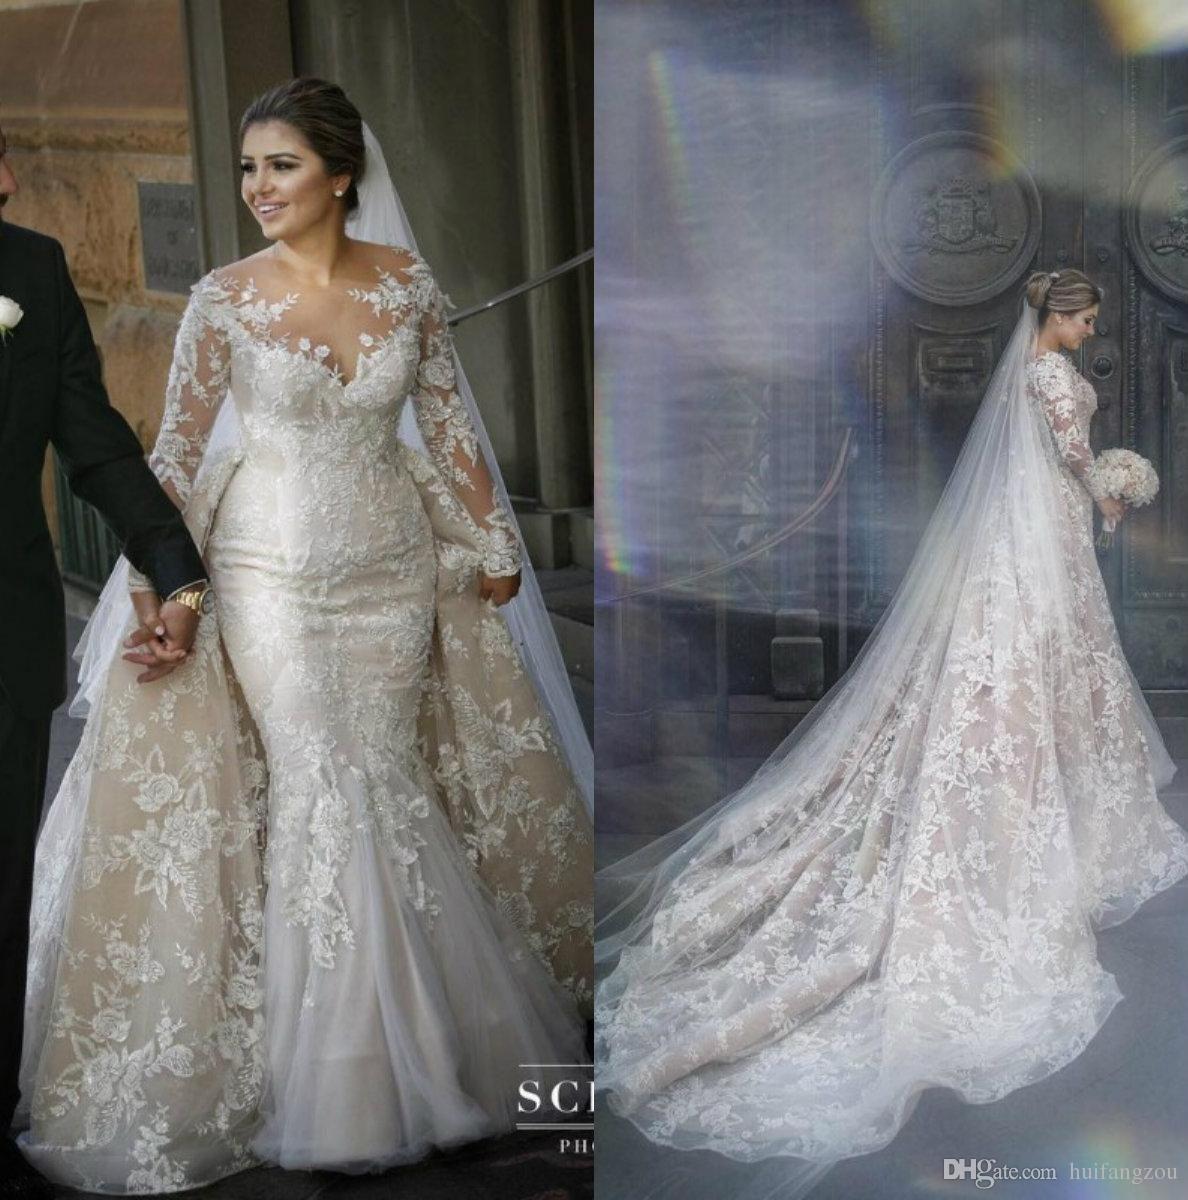 Vintage Mermaid Wedding Dress With Detachable Skirt Arabia Sheer Neck Full Appliques Long Plus Wedding Dresses Wedding Dress Long Sleeve Trendy Wedding Dresses